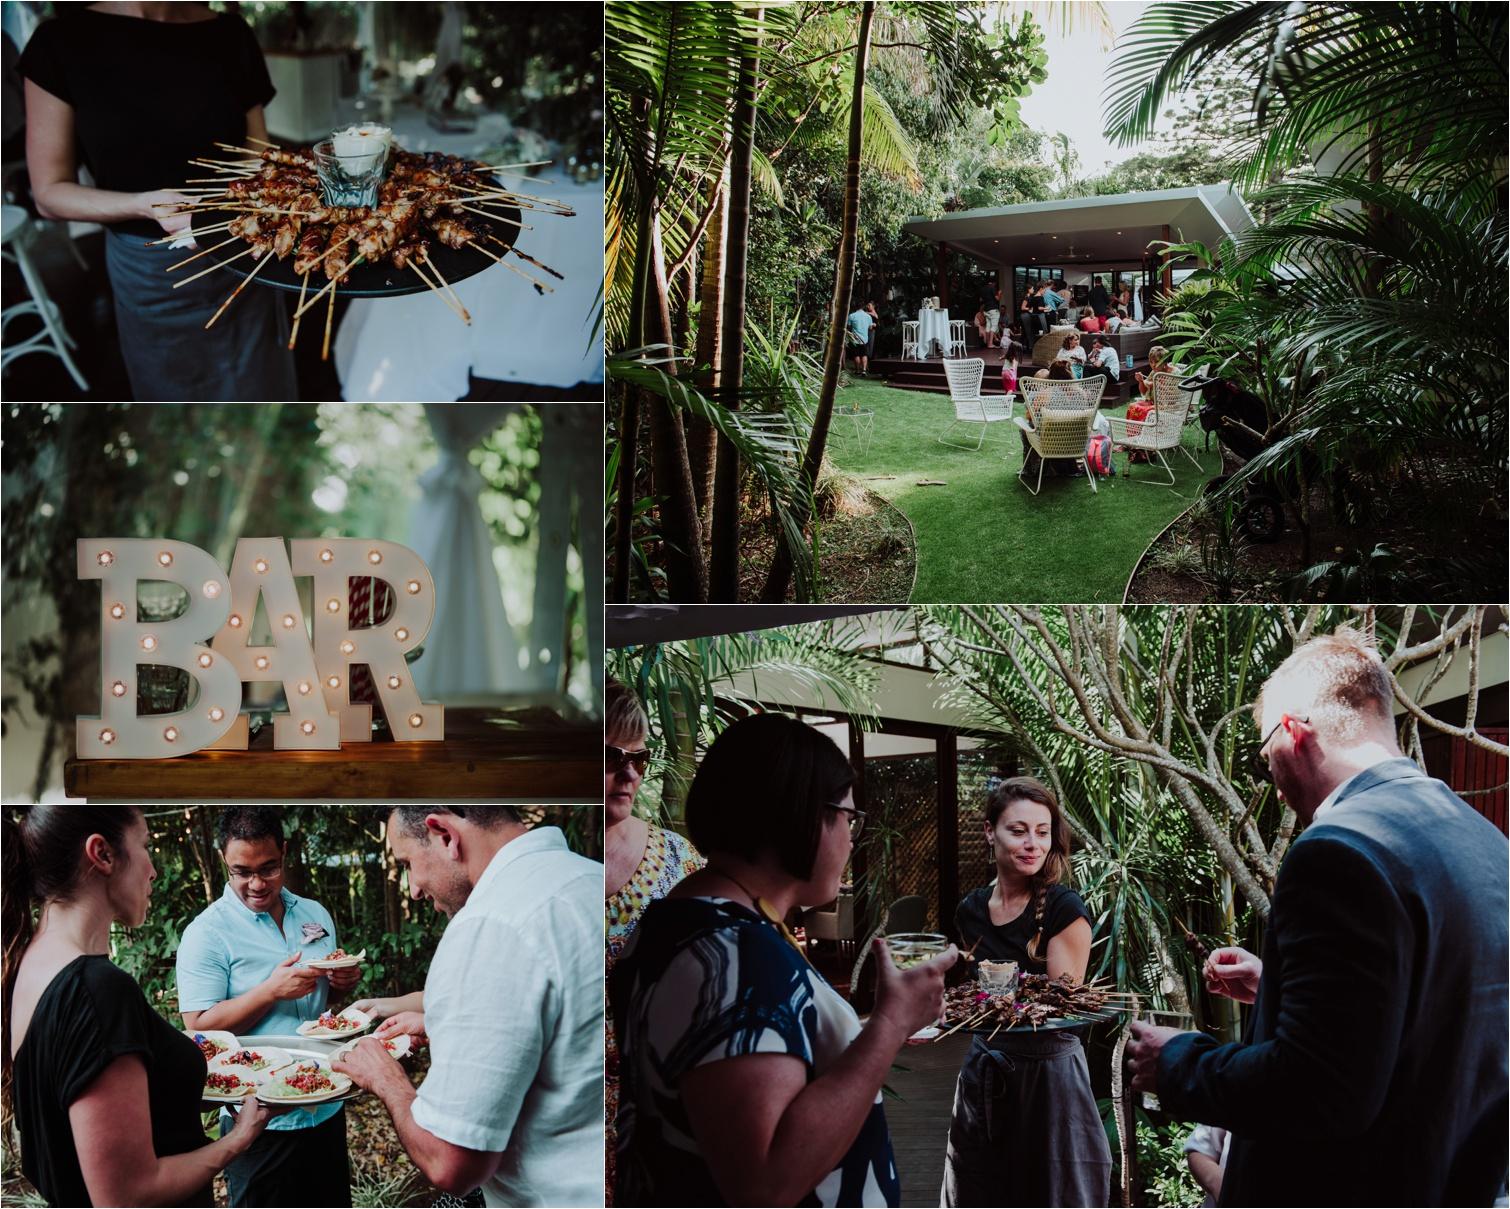 Byron Bay weddings catering